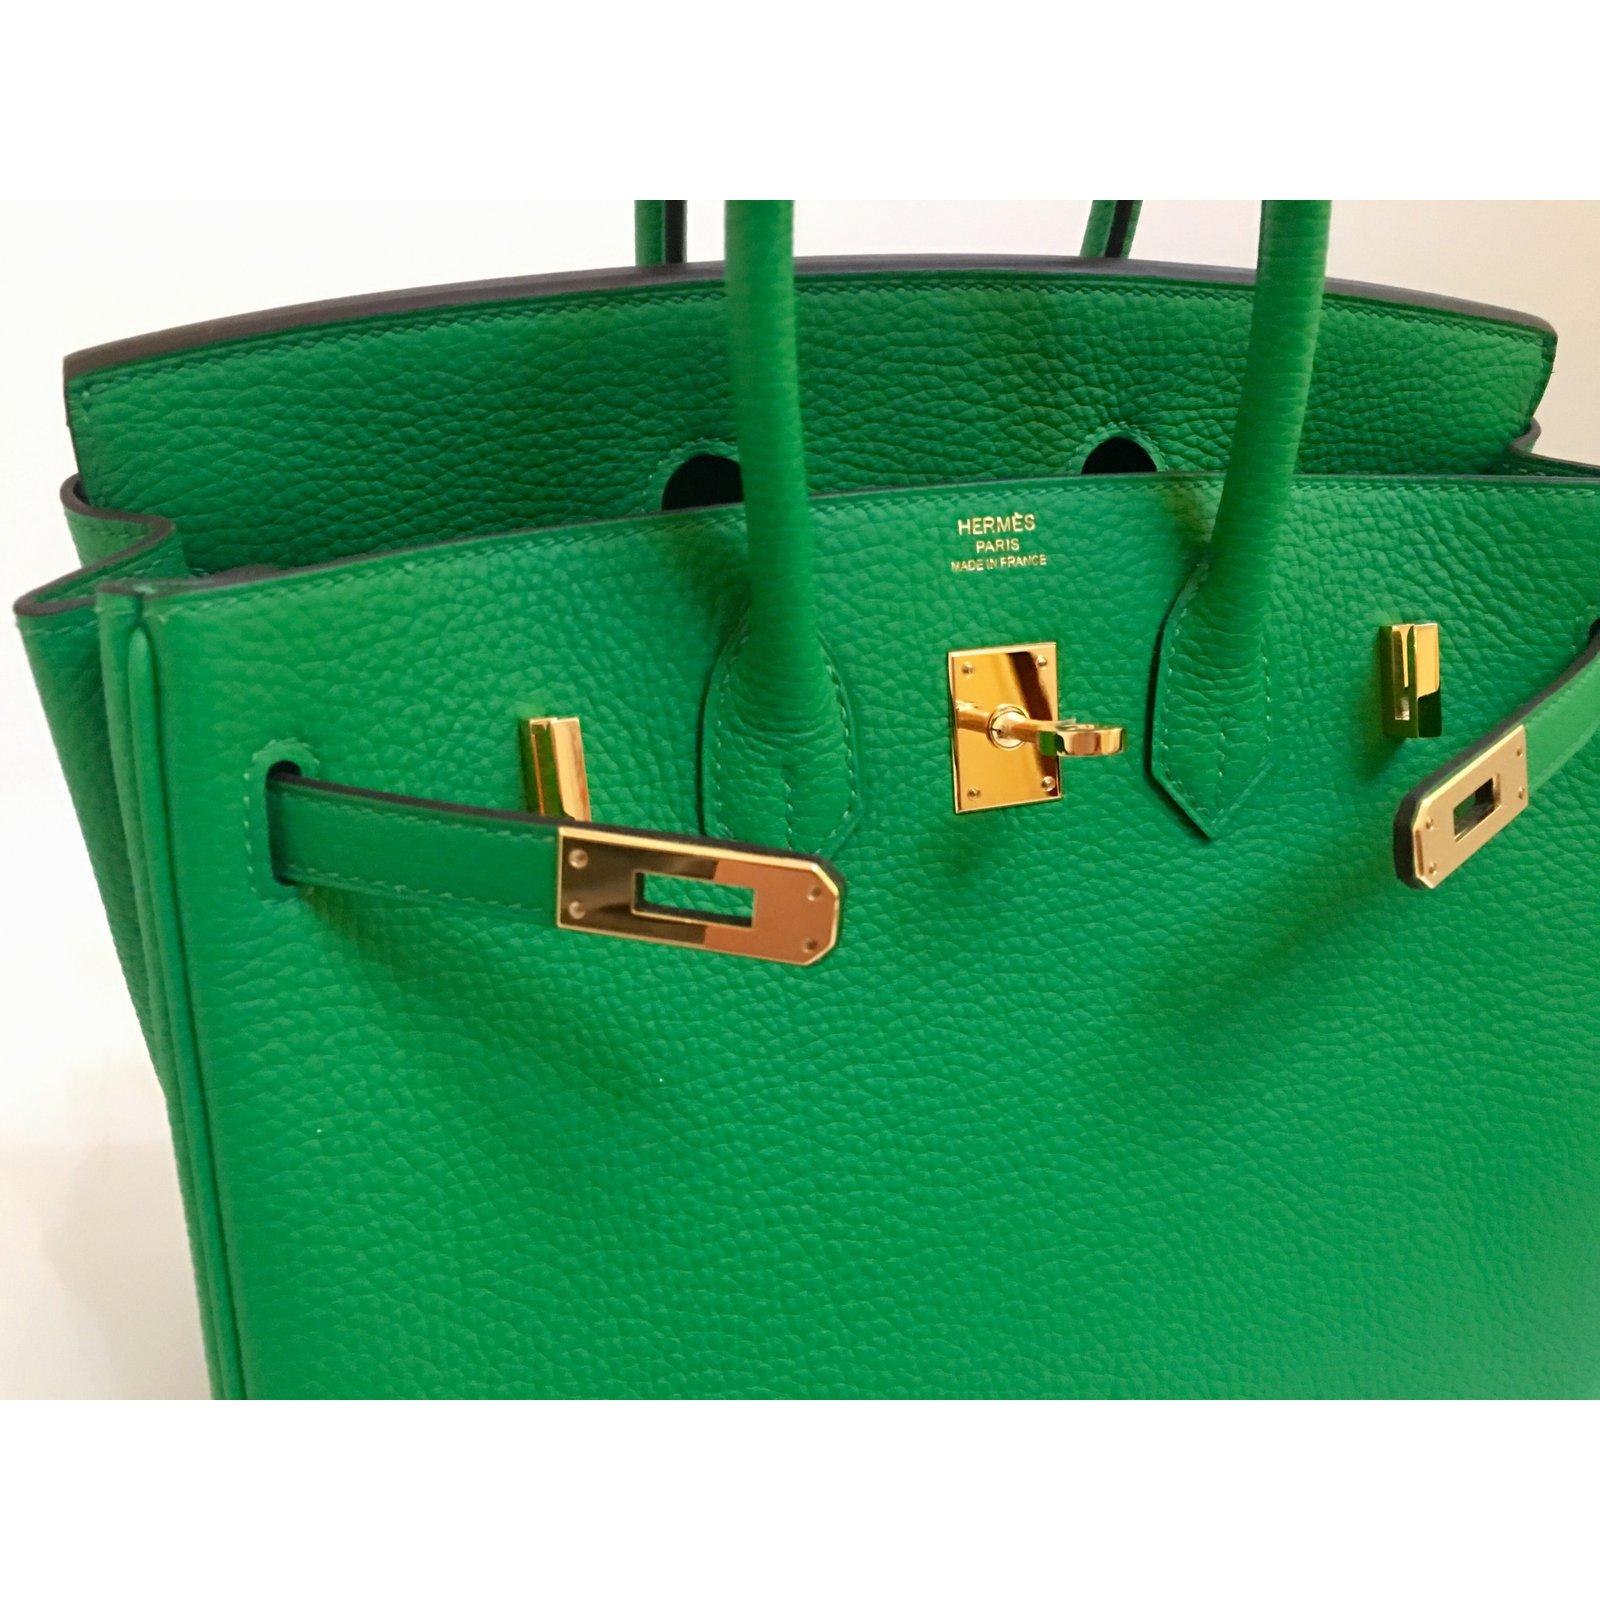 1ec4cb9317c Hermès Hermes Birkin 25cm Bamboo Togo Leather Gold Hardware Handbags  Leather Green ref.38061 - Joli Closet